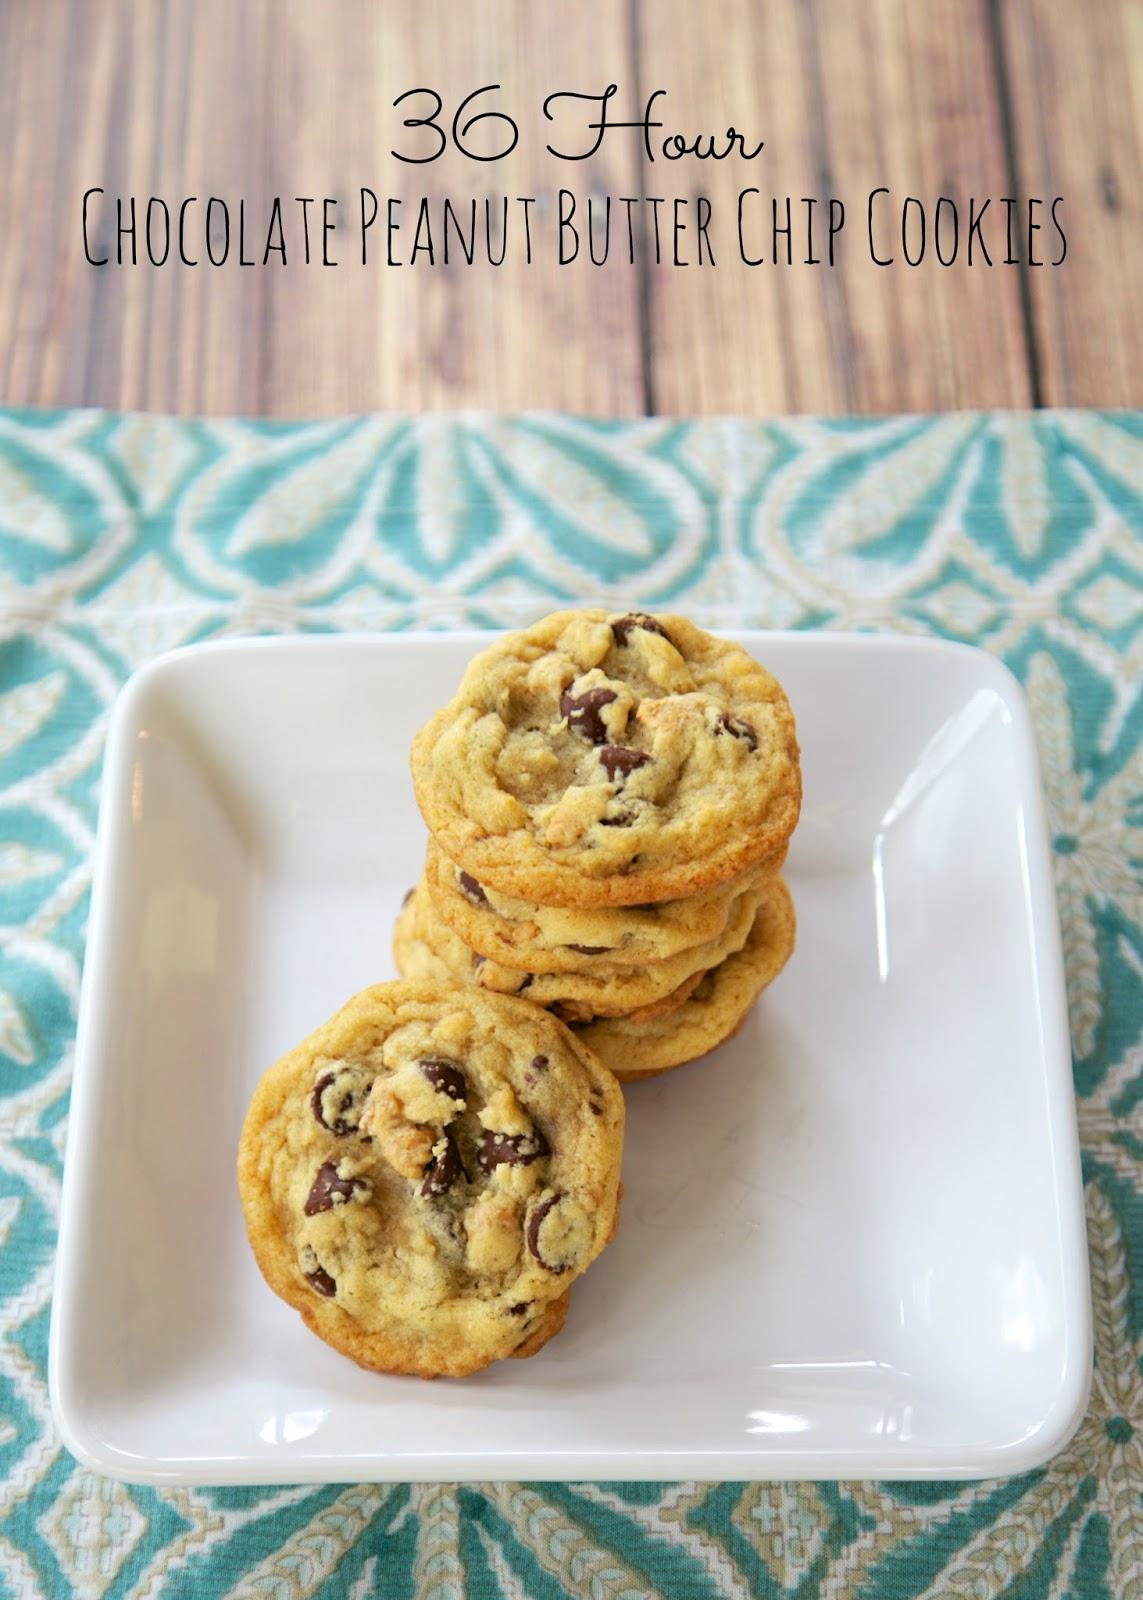 36 hour cookie recipe